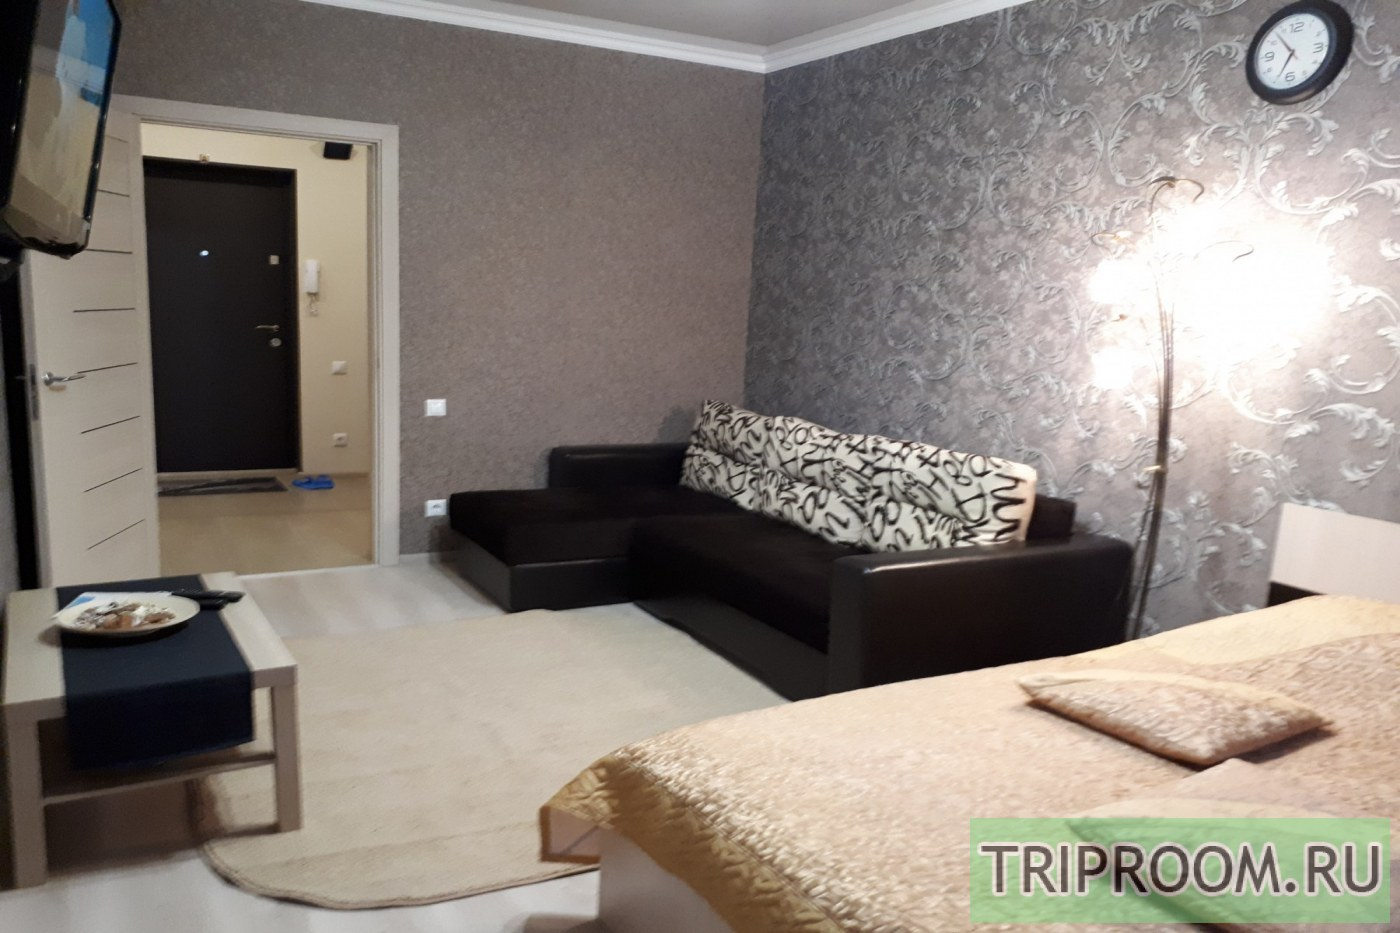 1-комнатная квартира посуточно (вариант № 39060), ул. Симиренко улица, фото № 2